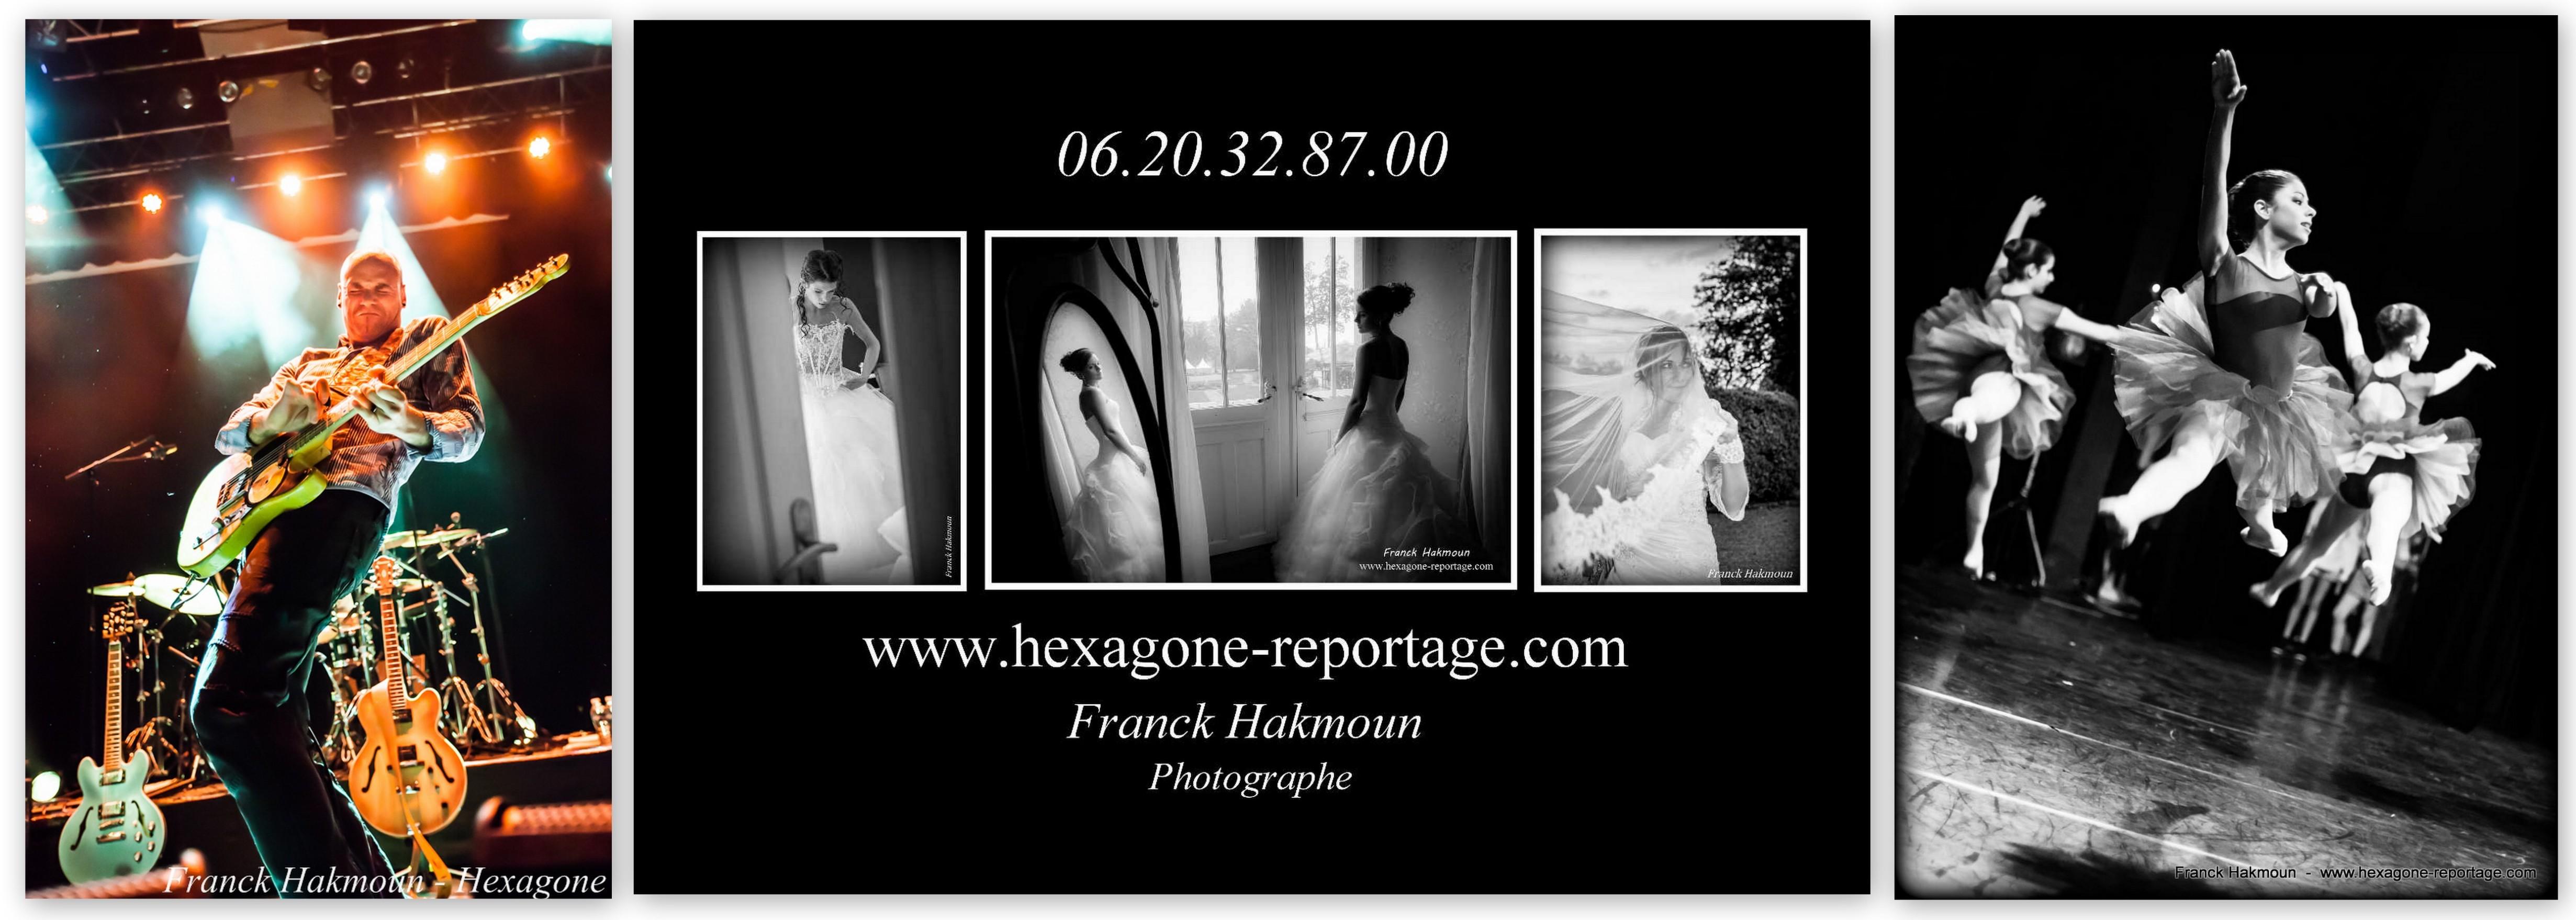 hexagone reportage photographe mariage franck hakmoun besancon. Black Bedroom Furniture Sets. Home Design Ideas